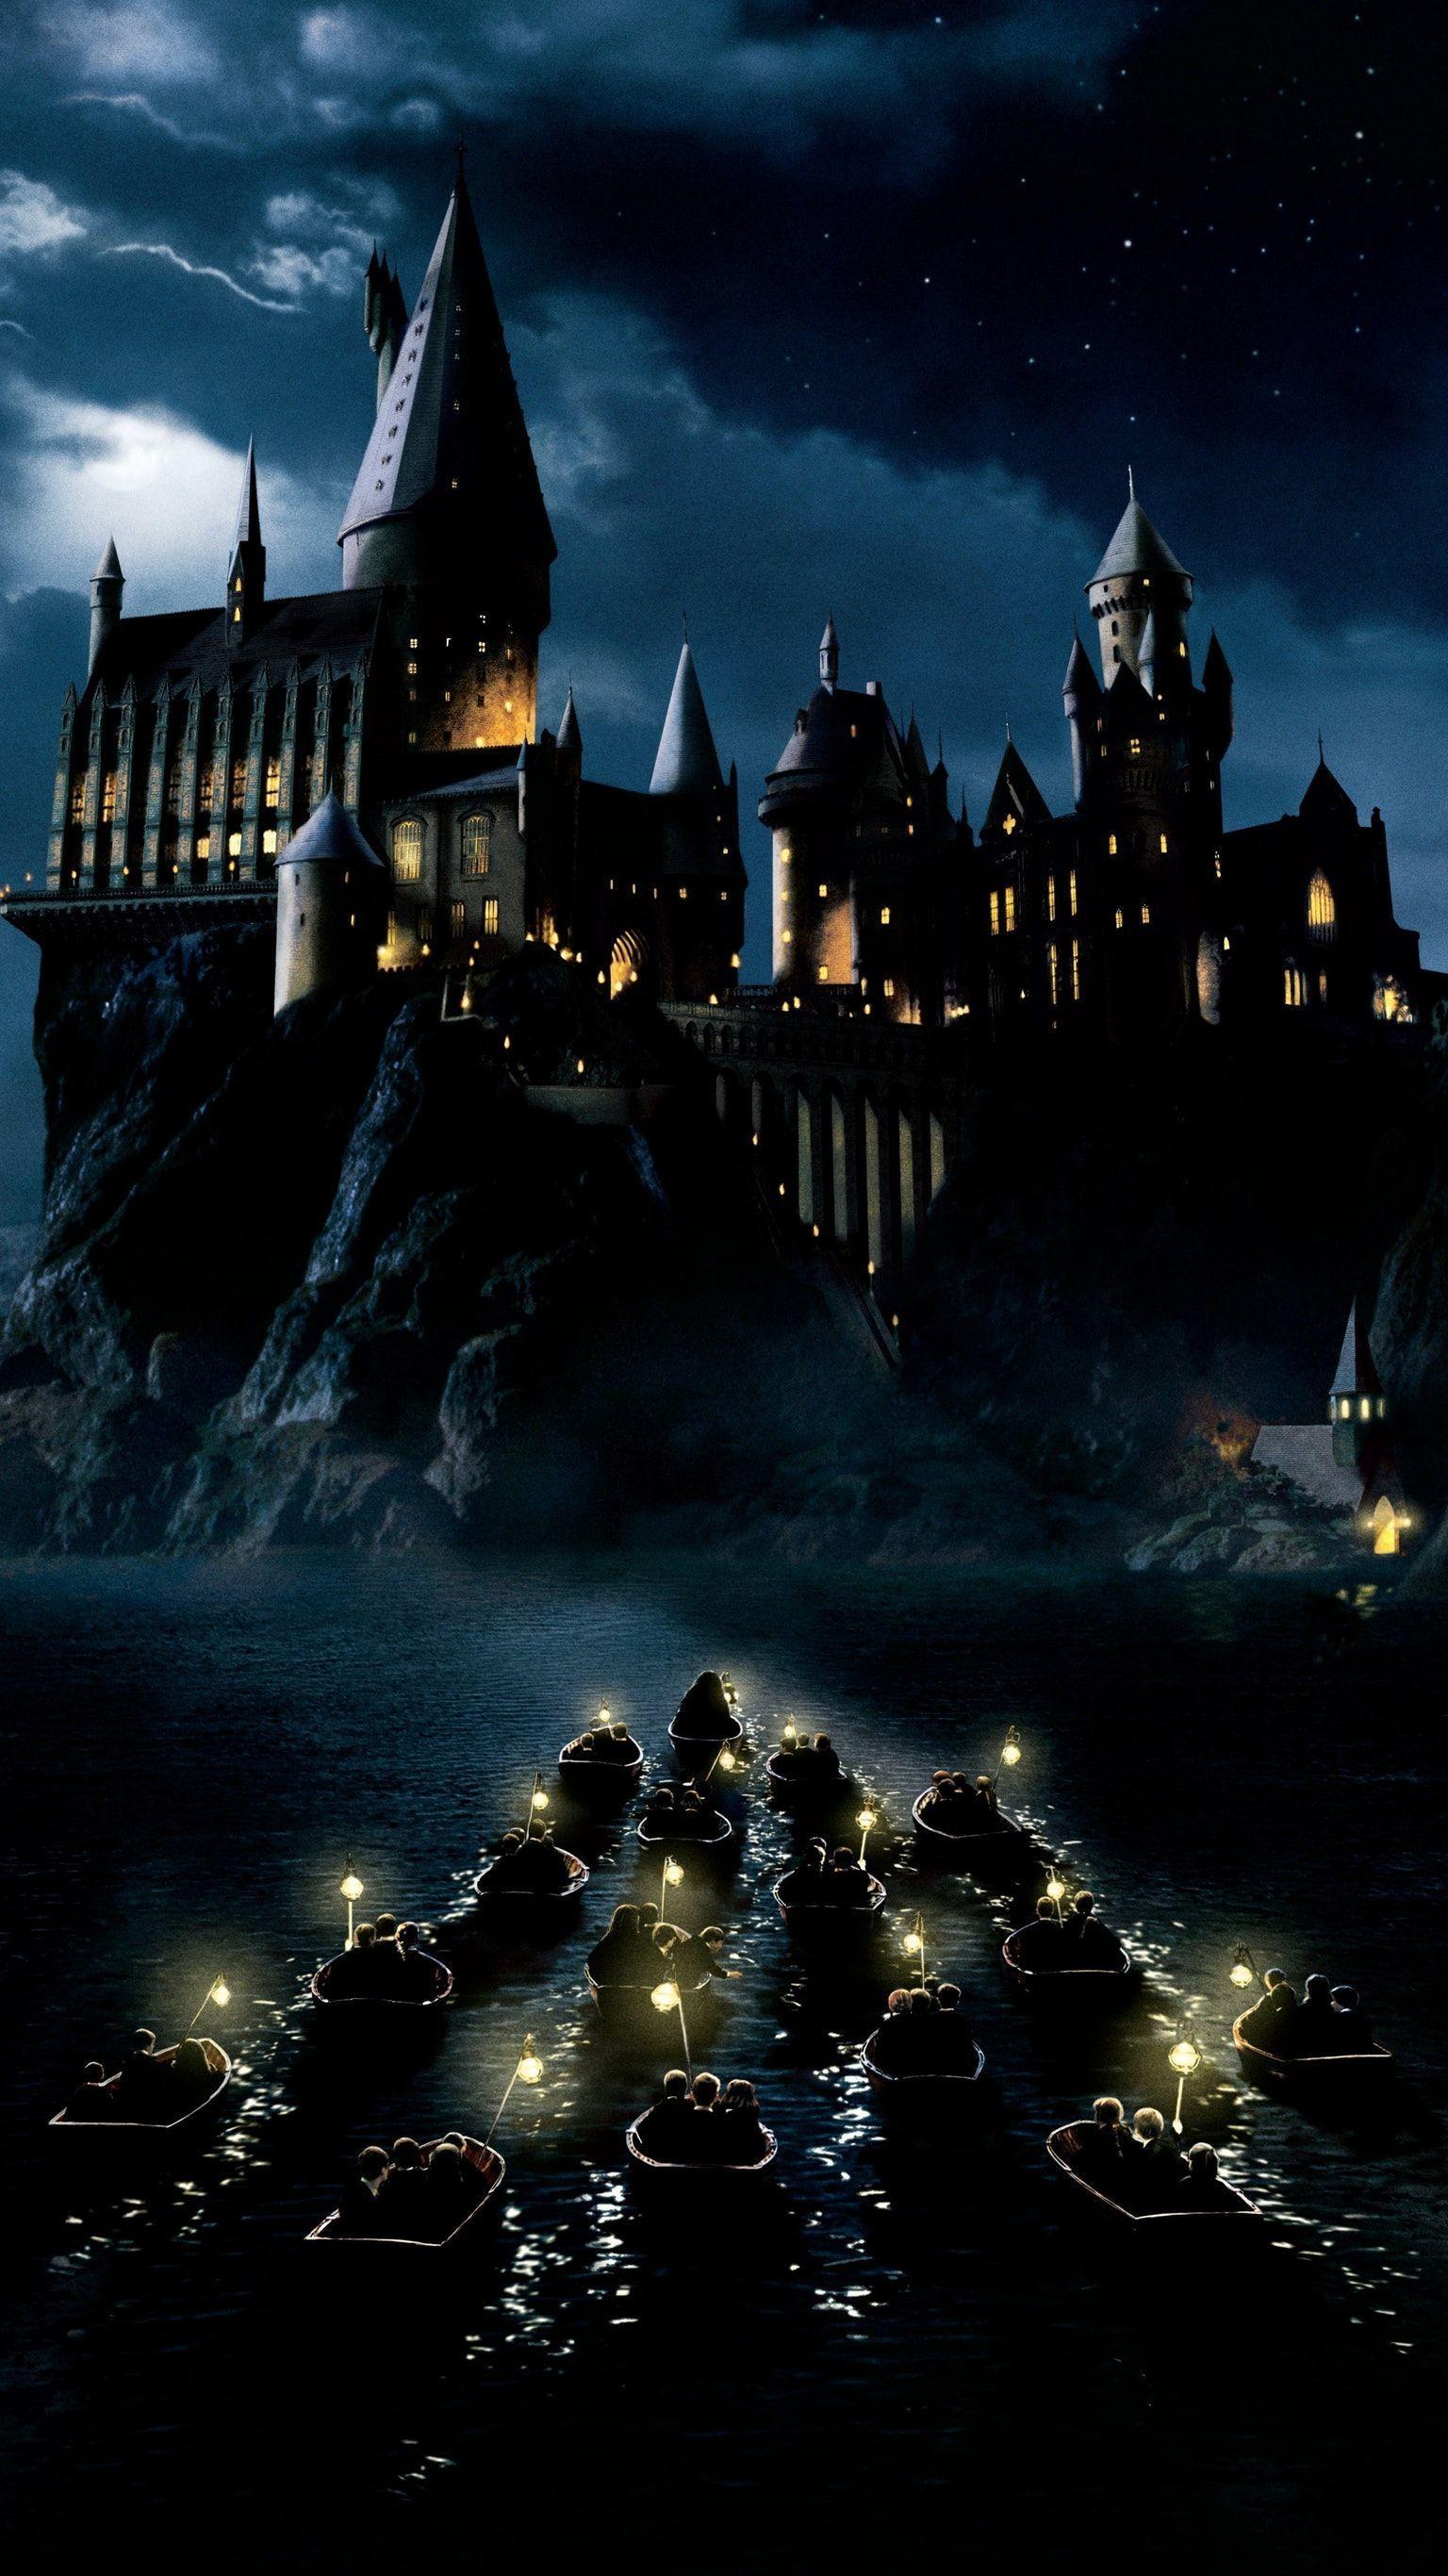 Hogwarts Disney Castle Iphone Wallpapers On Wallpaperdog